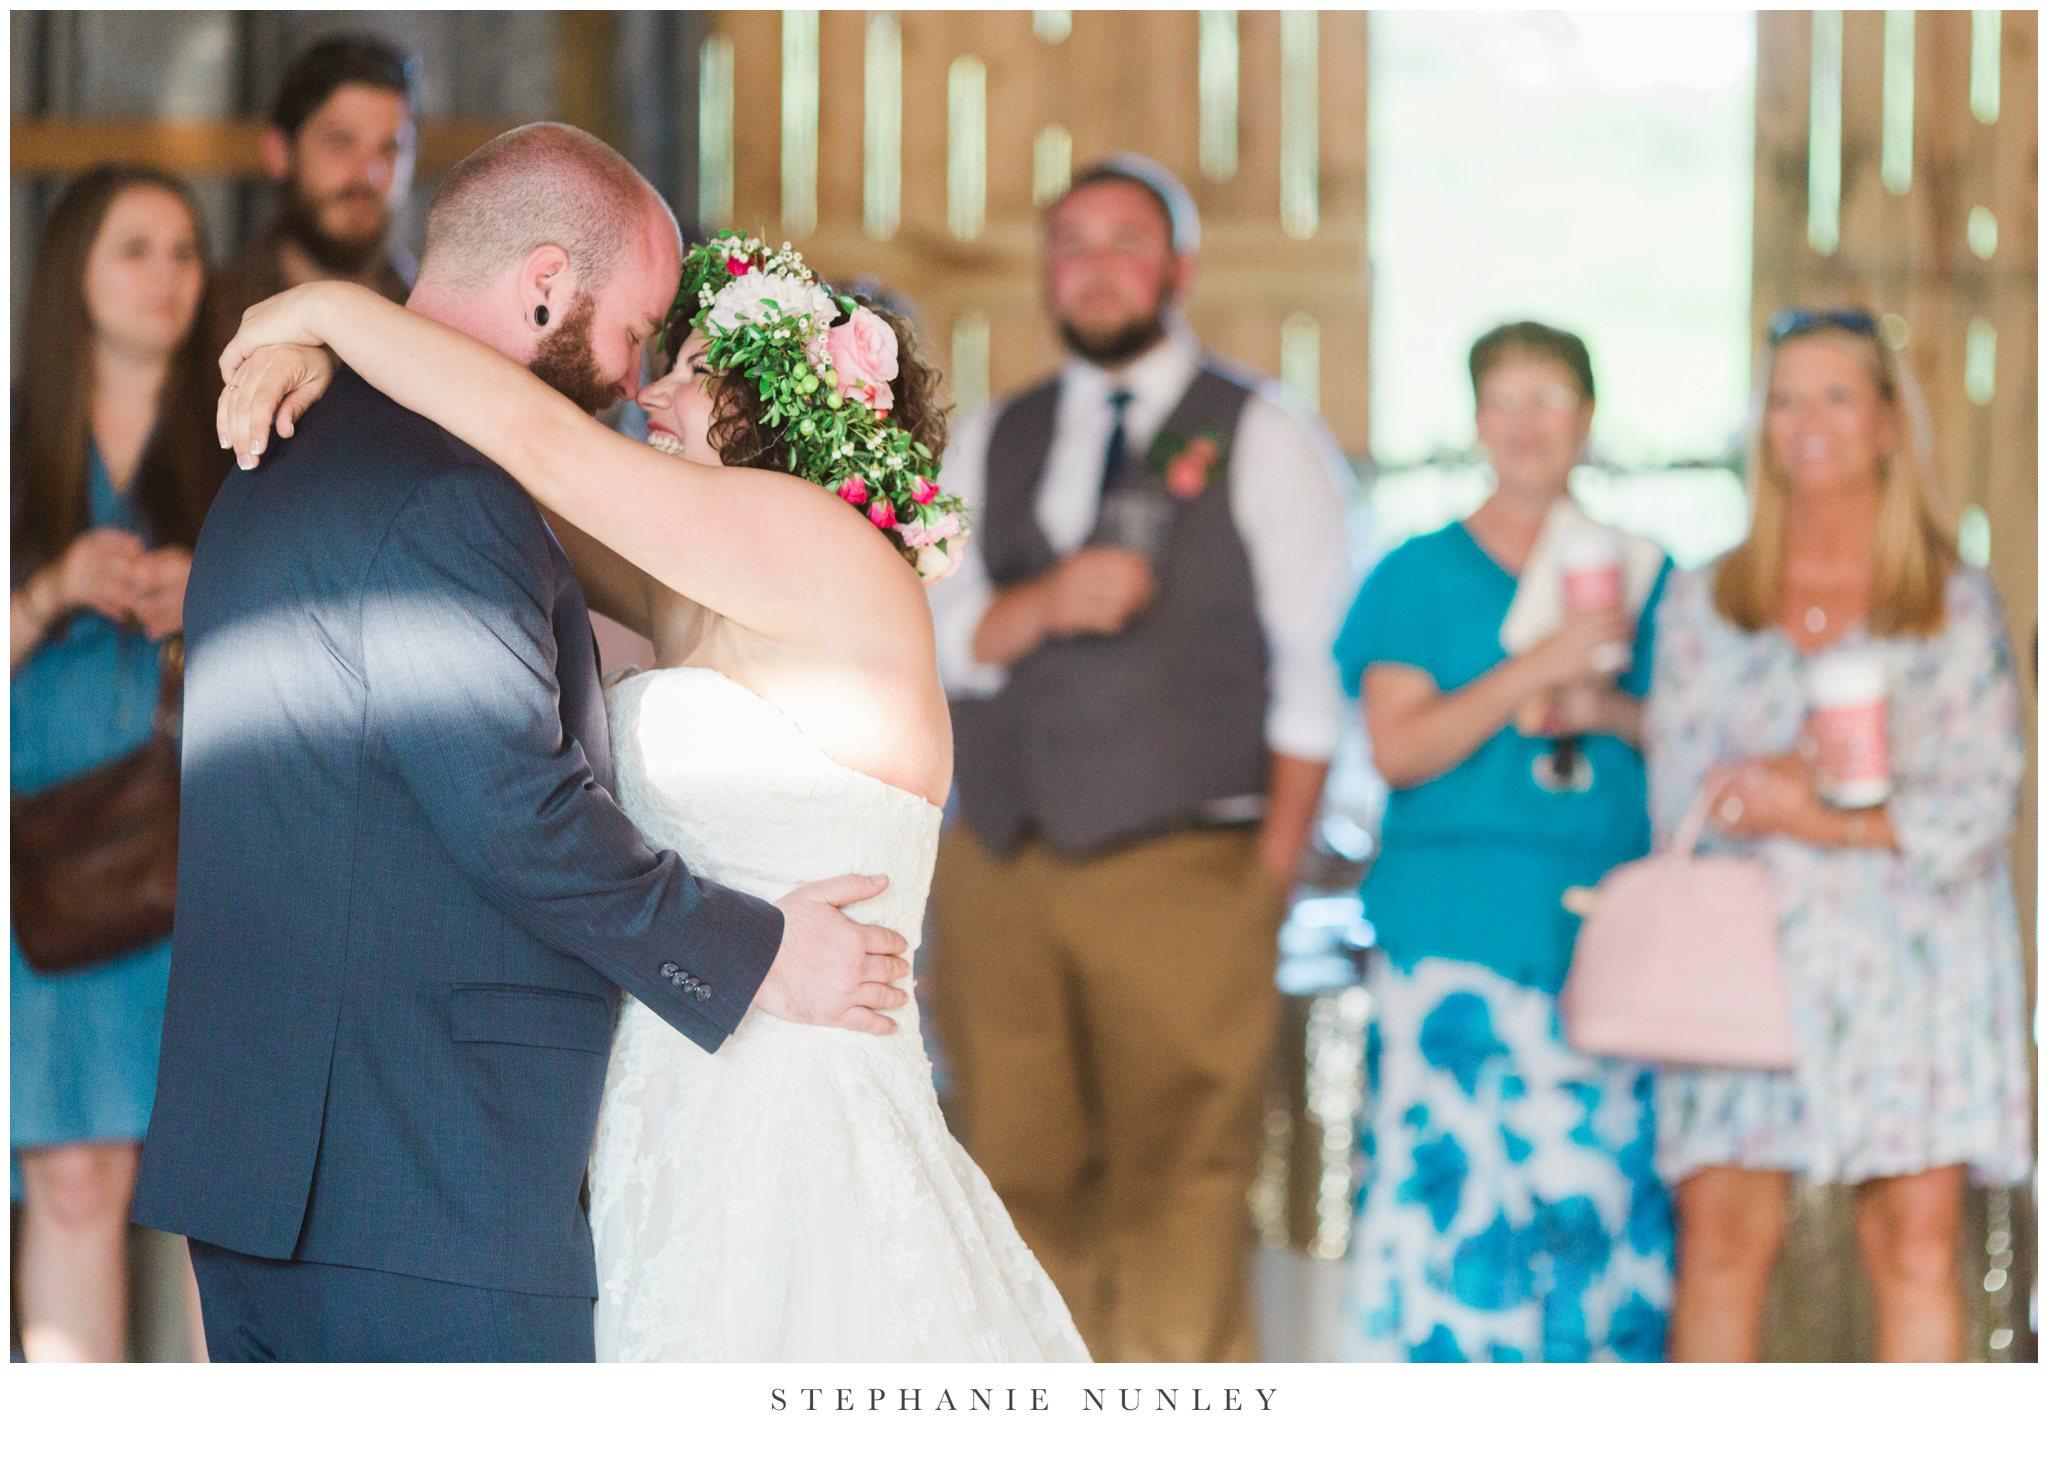 romantic-outdoor-wedding-with-flower-crown-0130.jpg